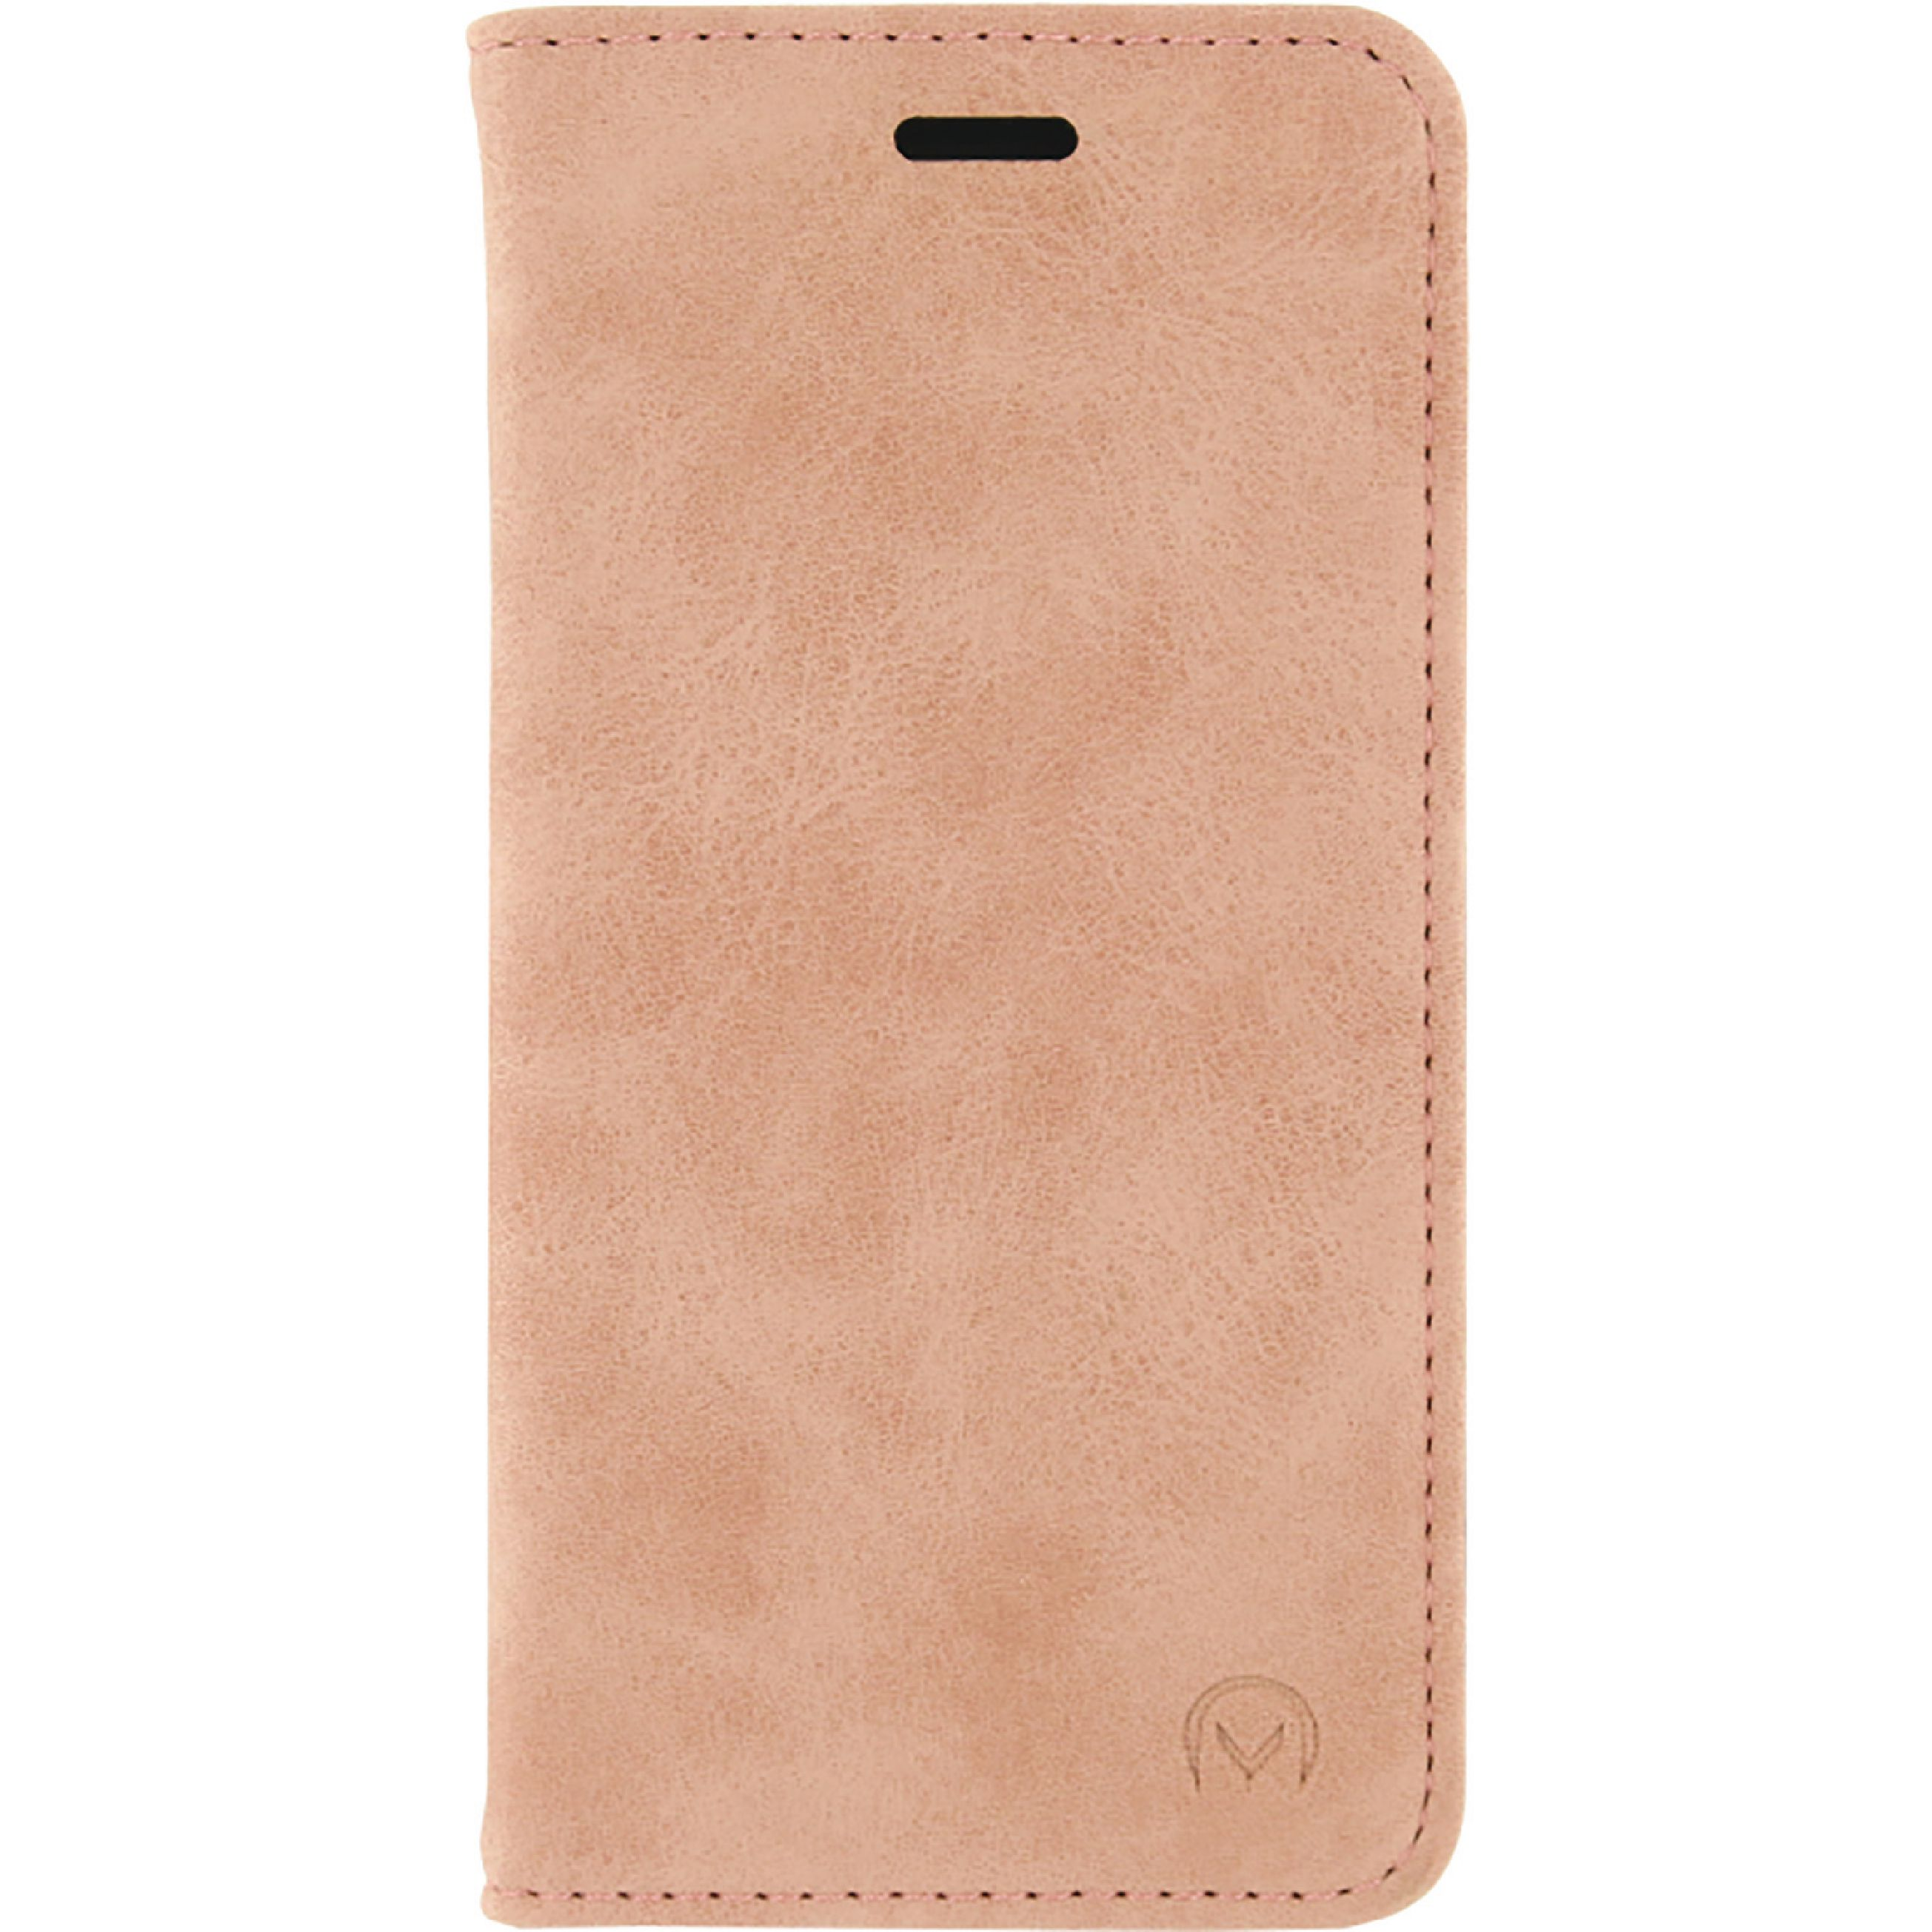 Image of   Telefon Premium Blødt Bogetui Samsung Galaxy S6 Pink